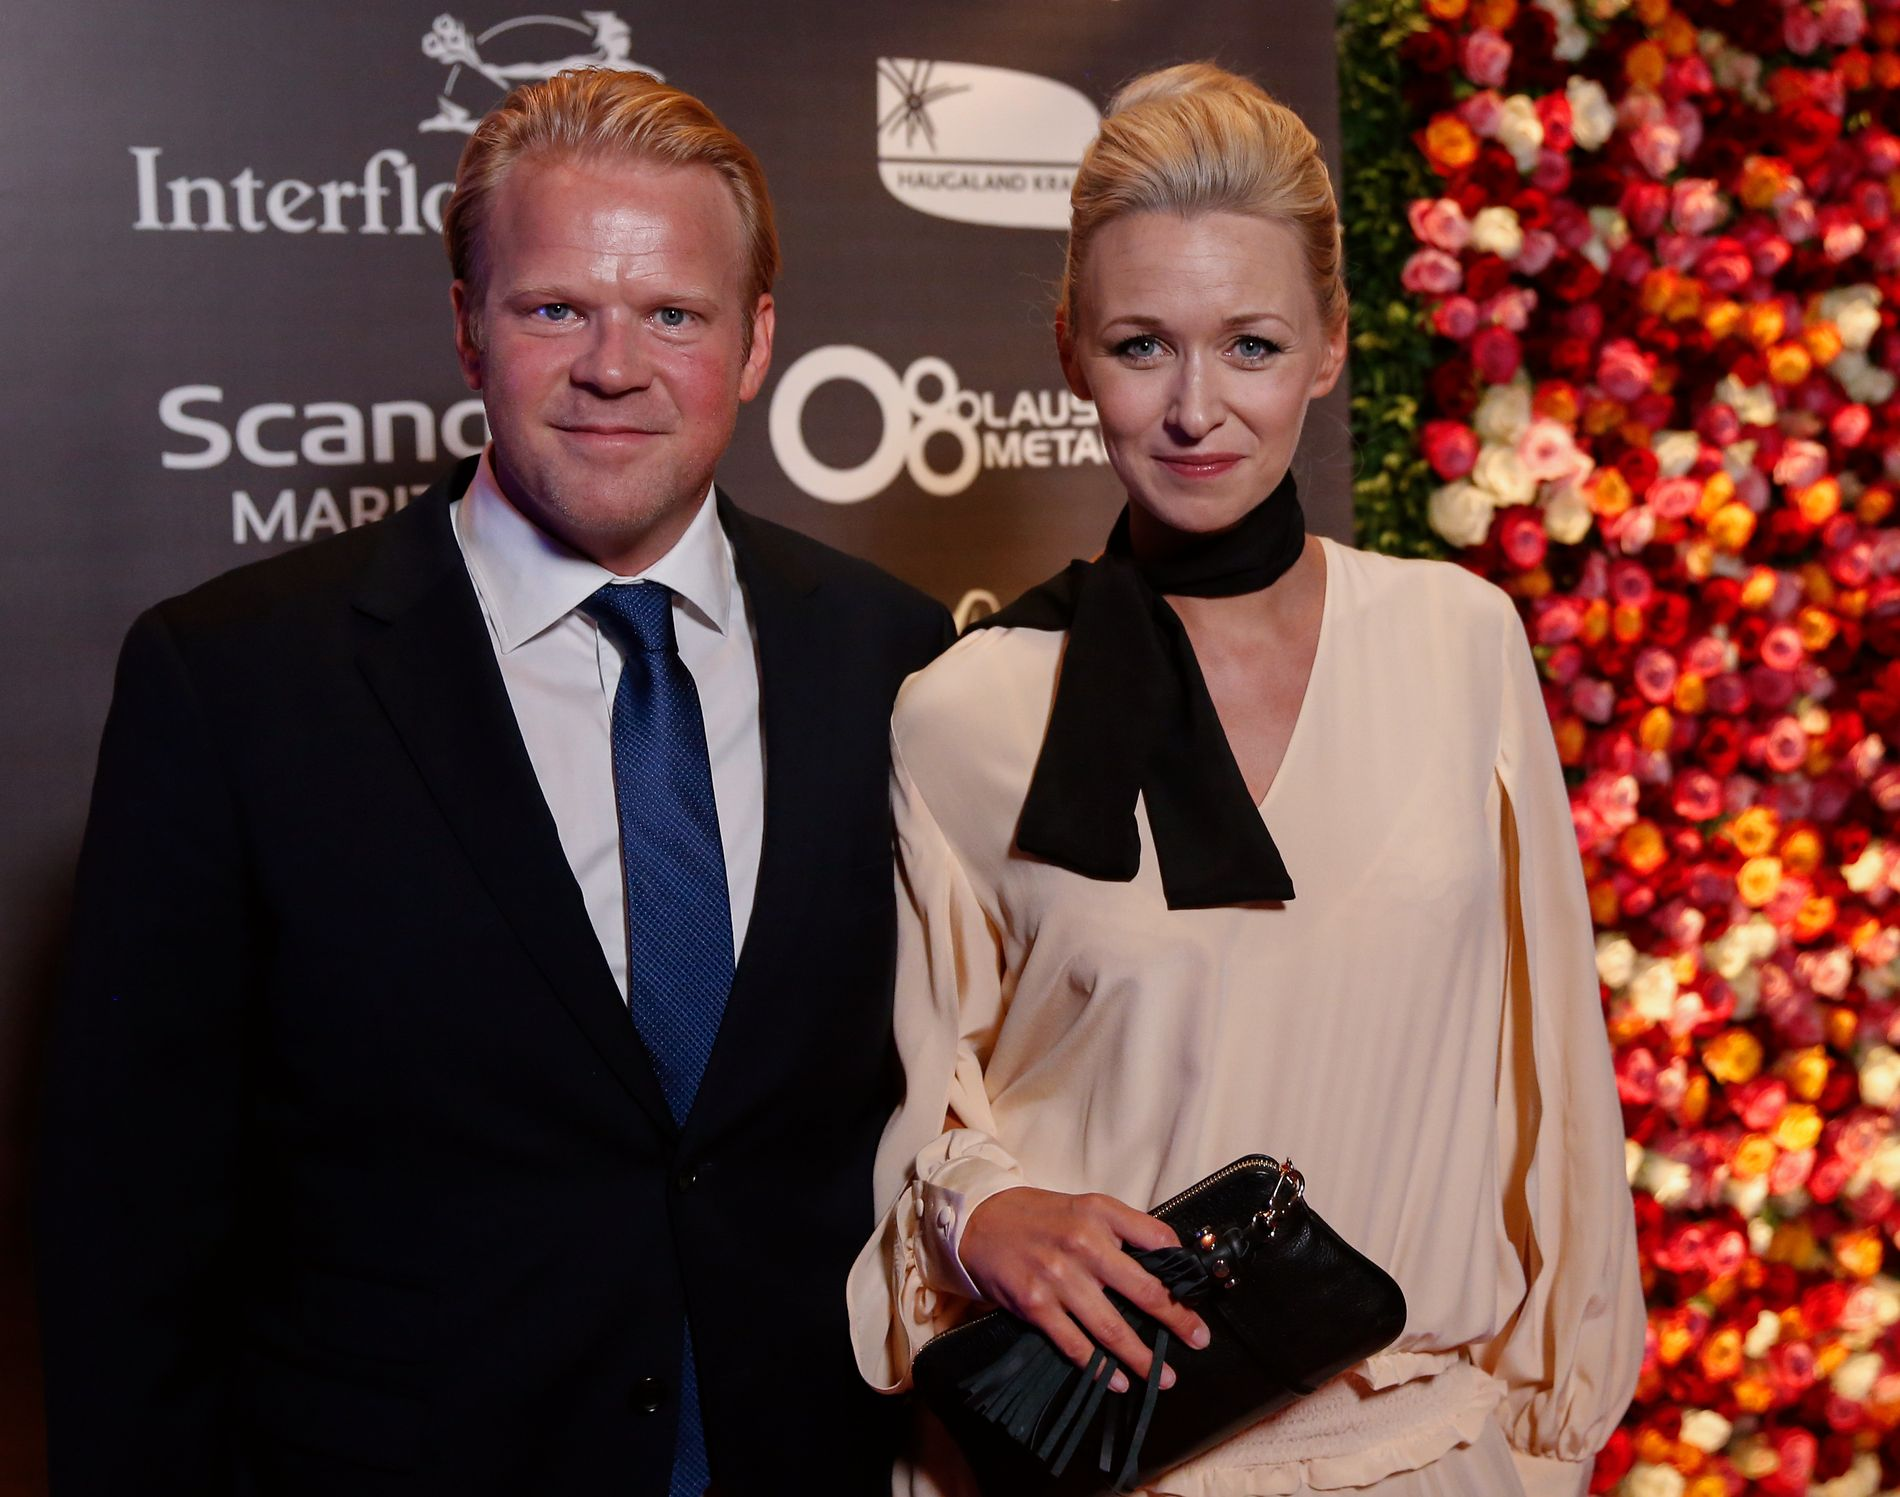 BLE FORELDRE I JANUAR: Anders Baasmo Christiansen og Marie Blokhus, her under Amanda-utdelingen i Haugesund i fjor.